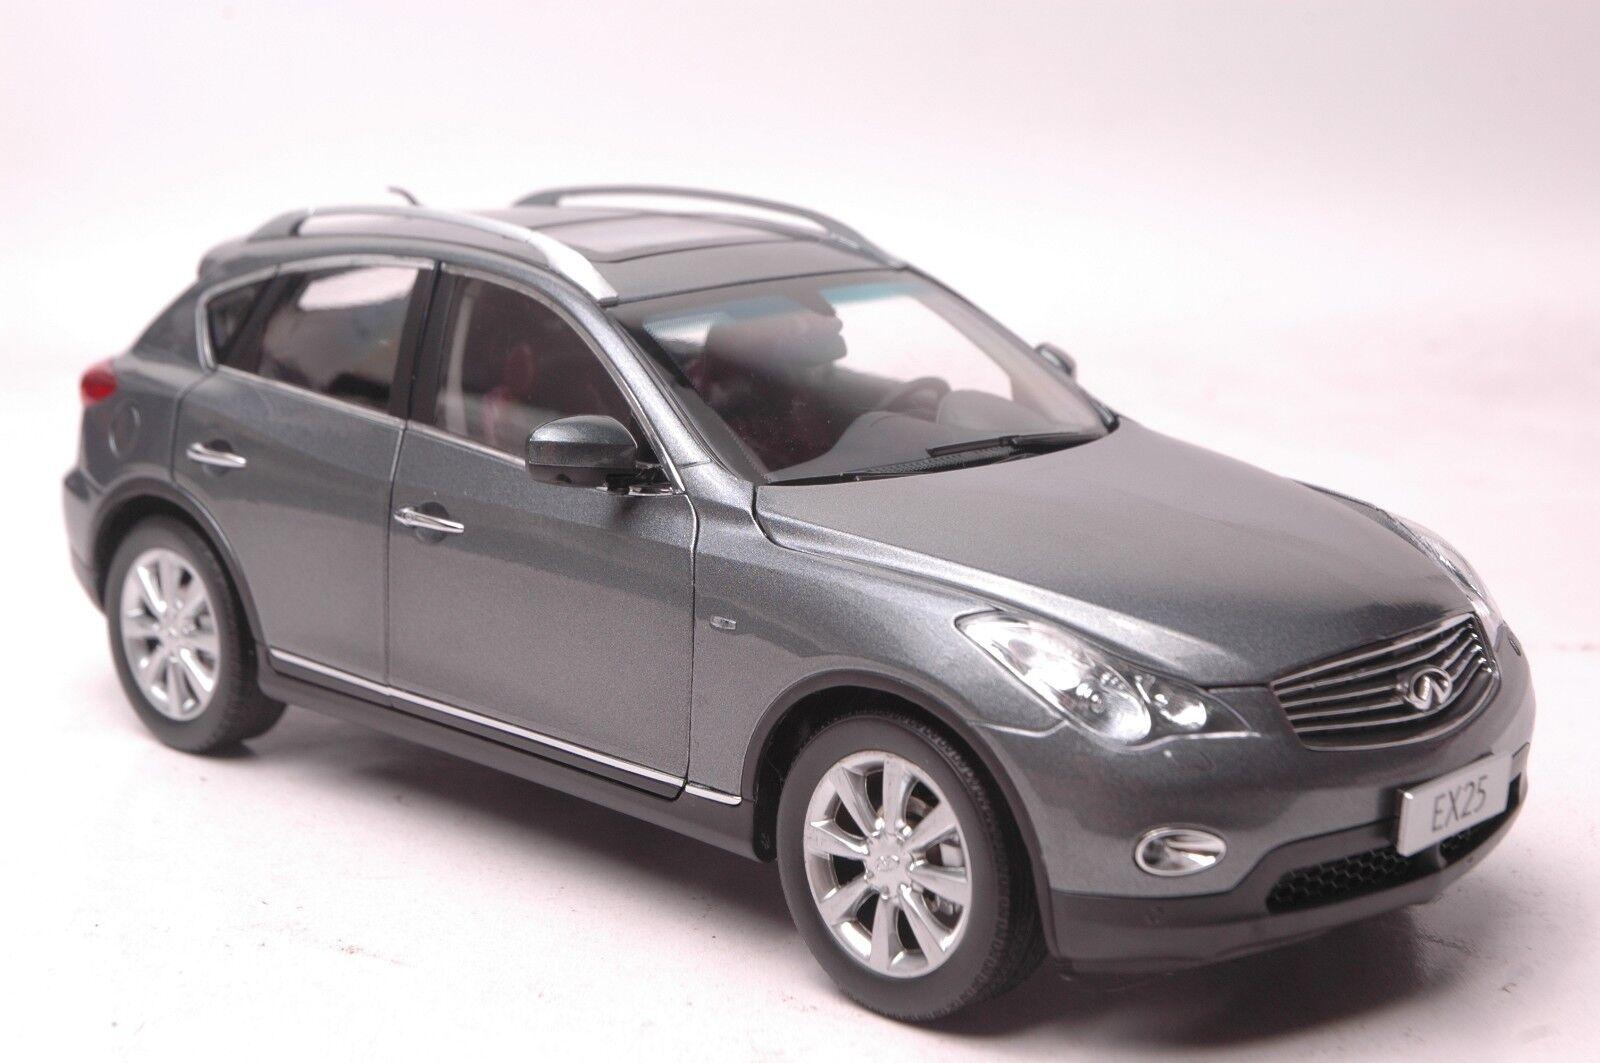 Infiniti ex25 auto - modell im maßstab 1,18